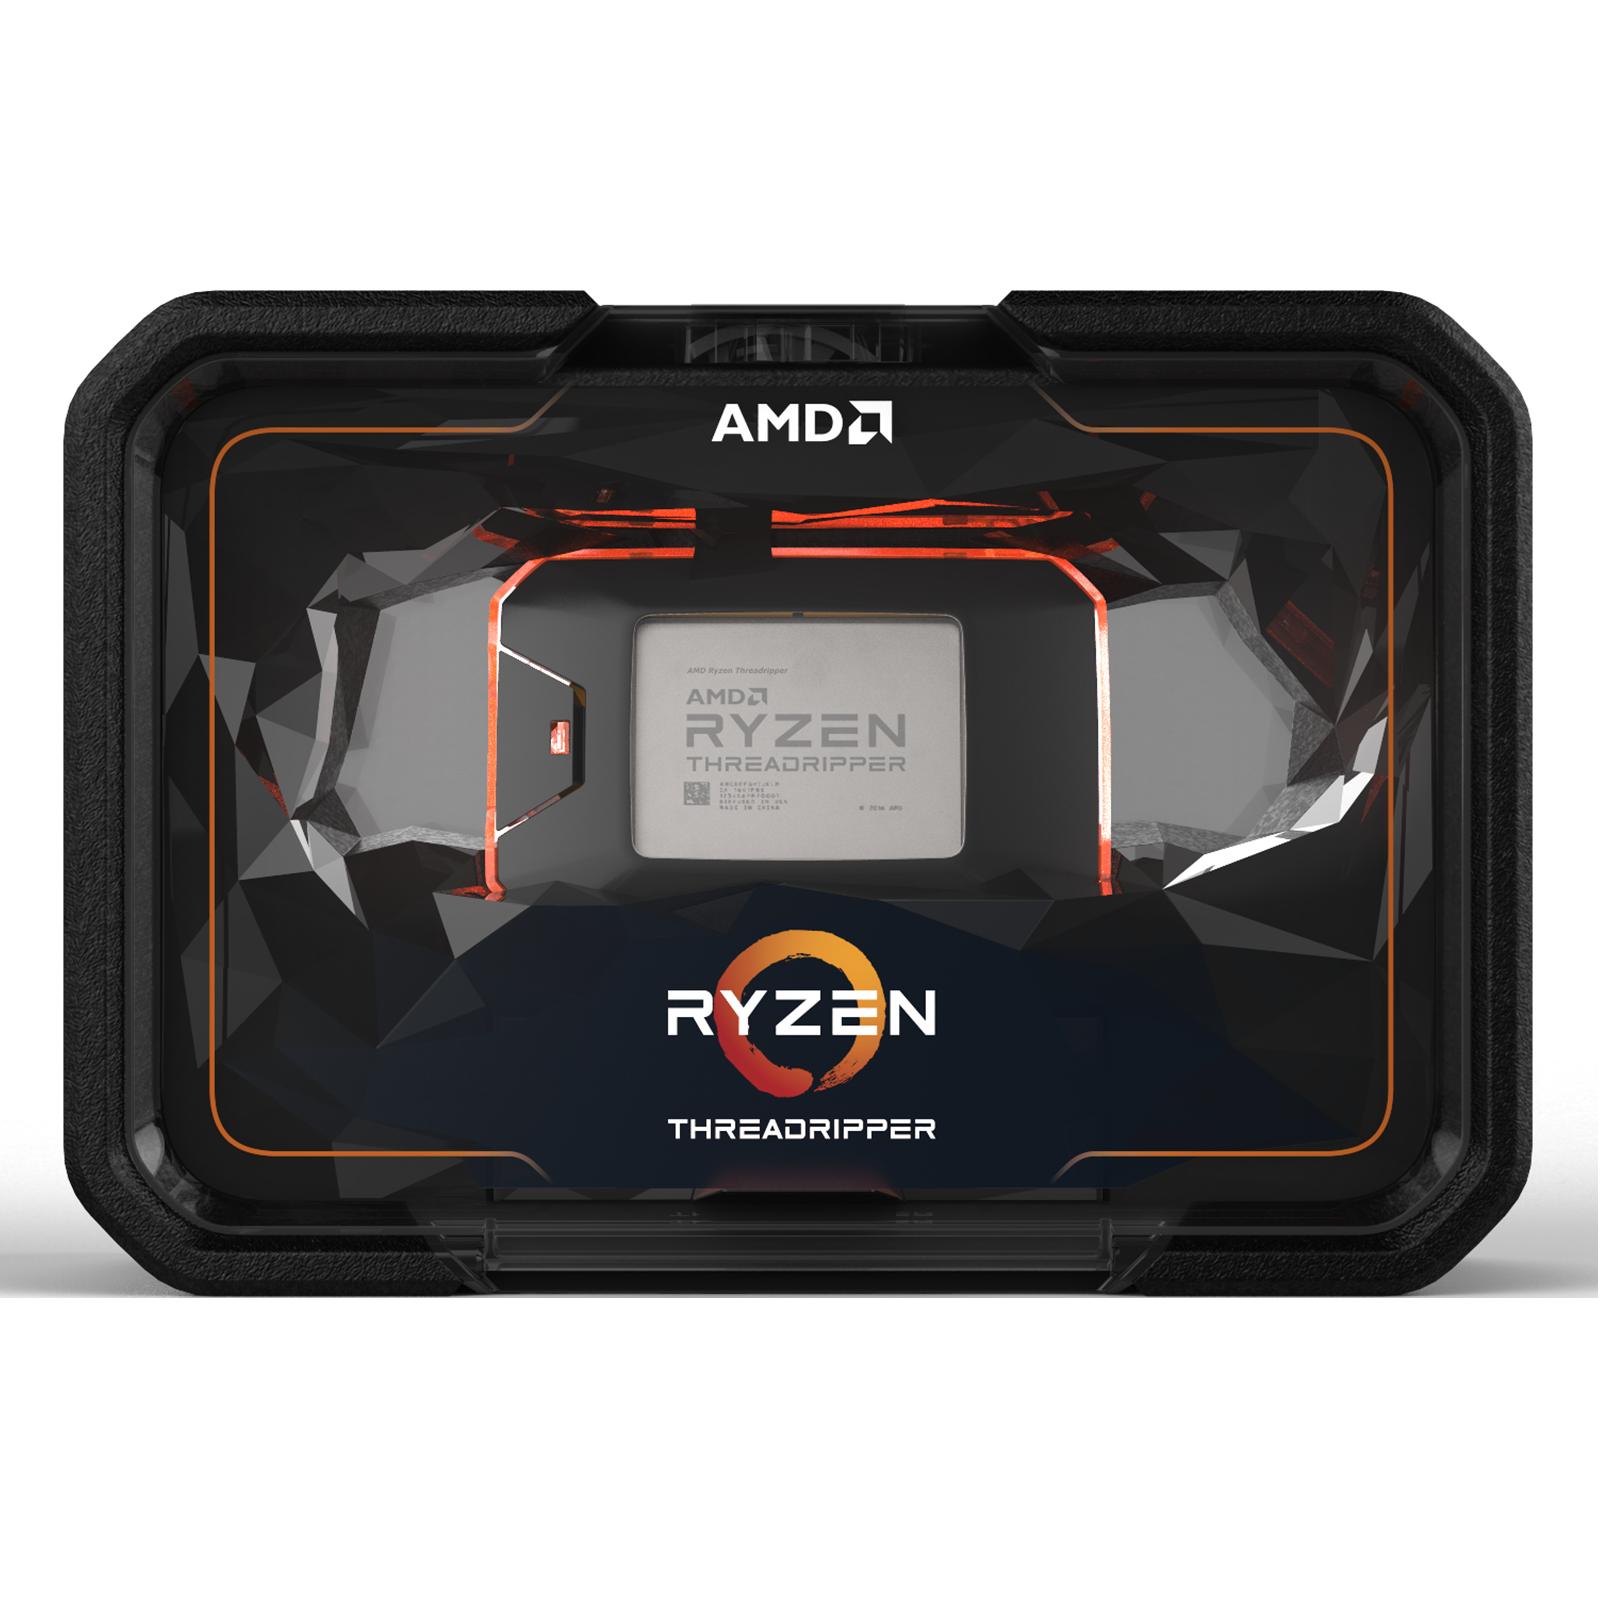 AMD Ryzen Threadripper 7 5 3 2700X 2700 2600X 2600 AM4 Processor PC CPU 5